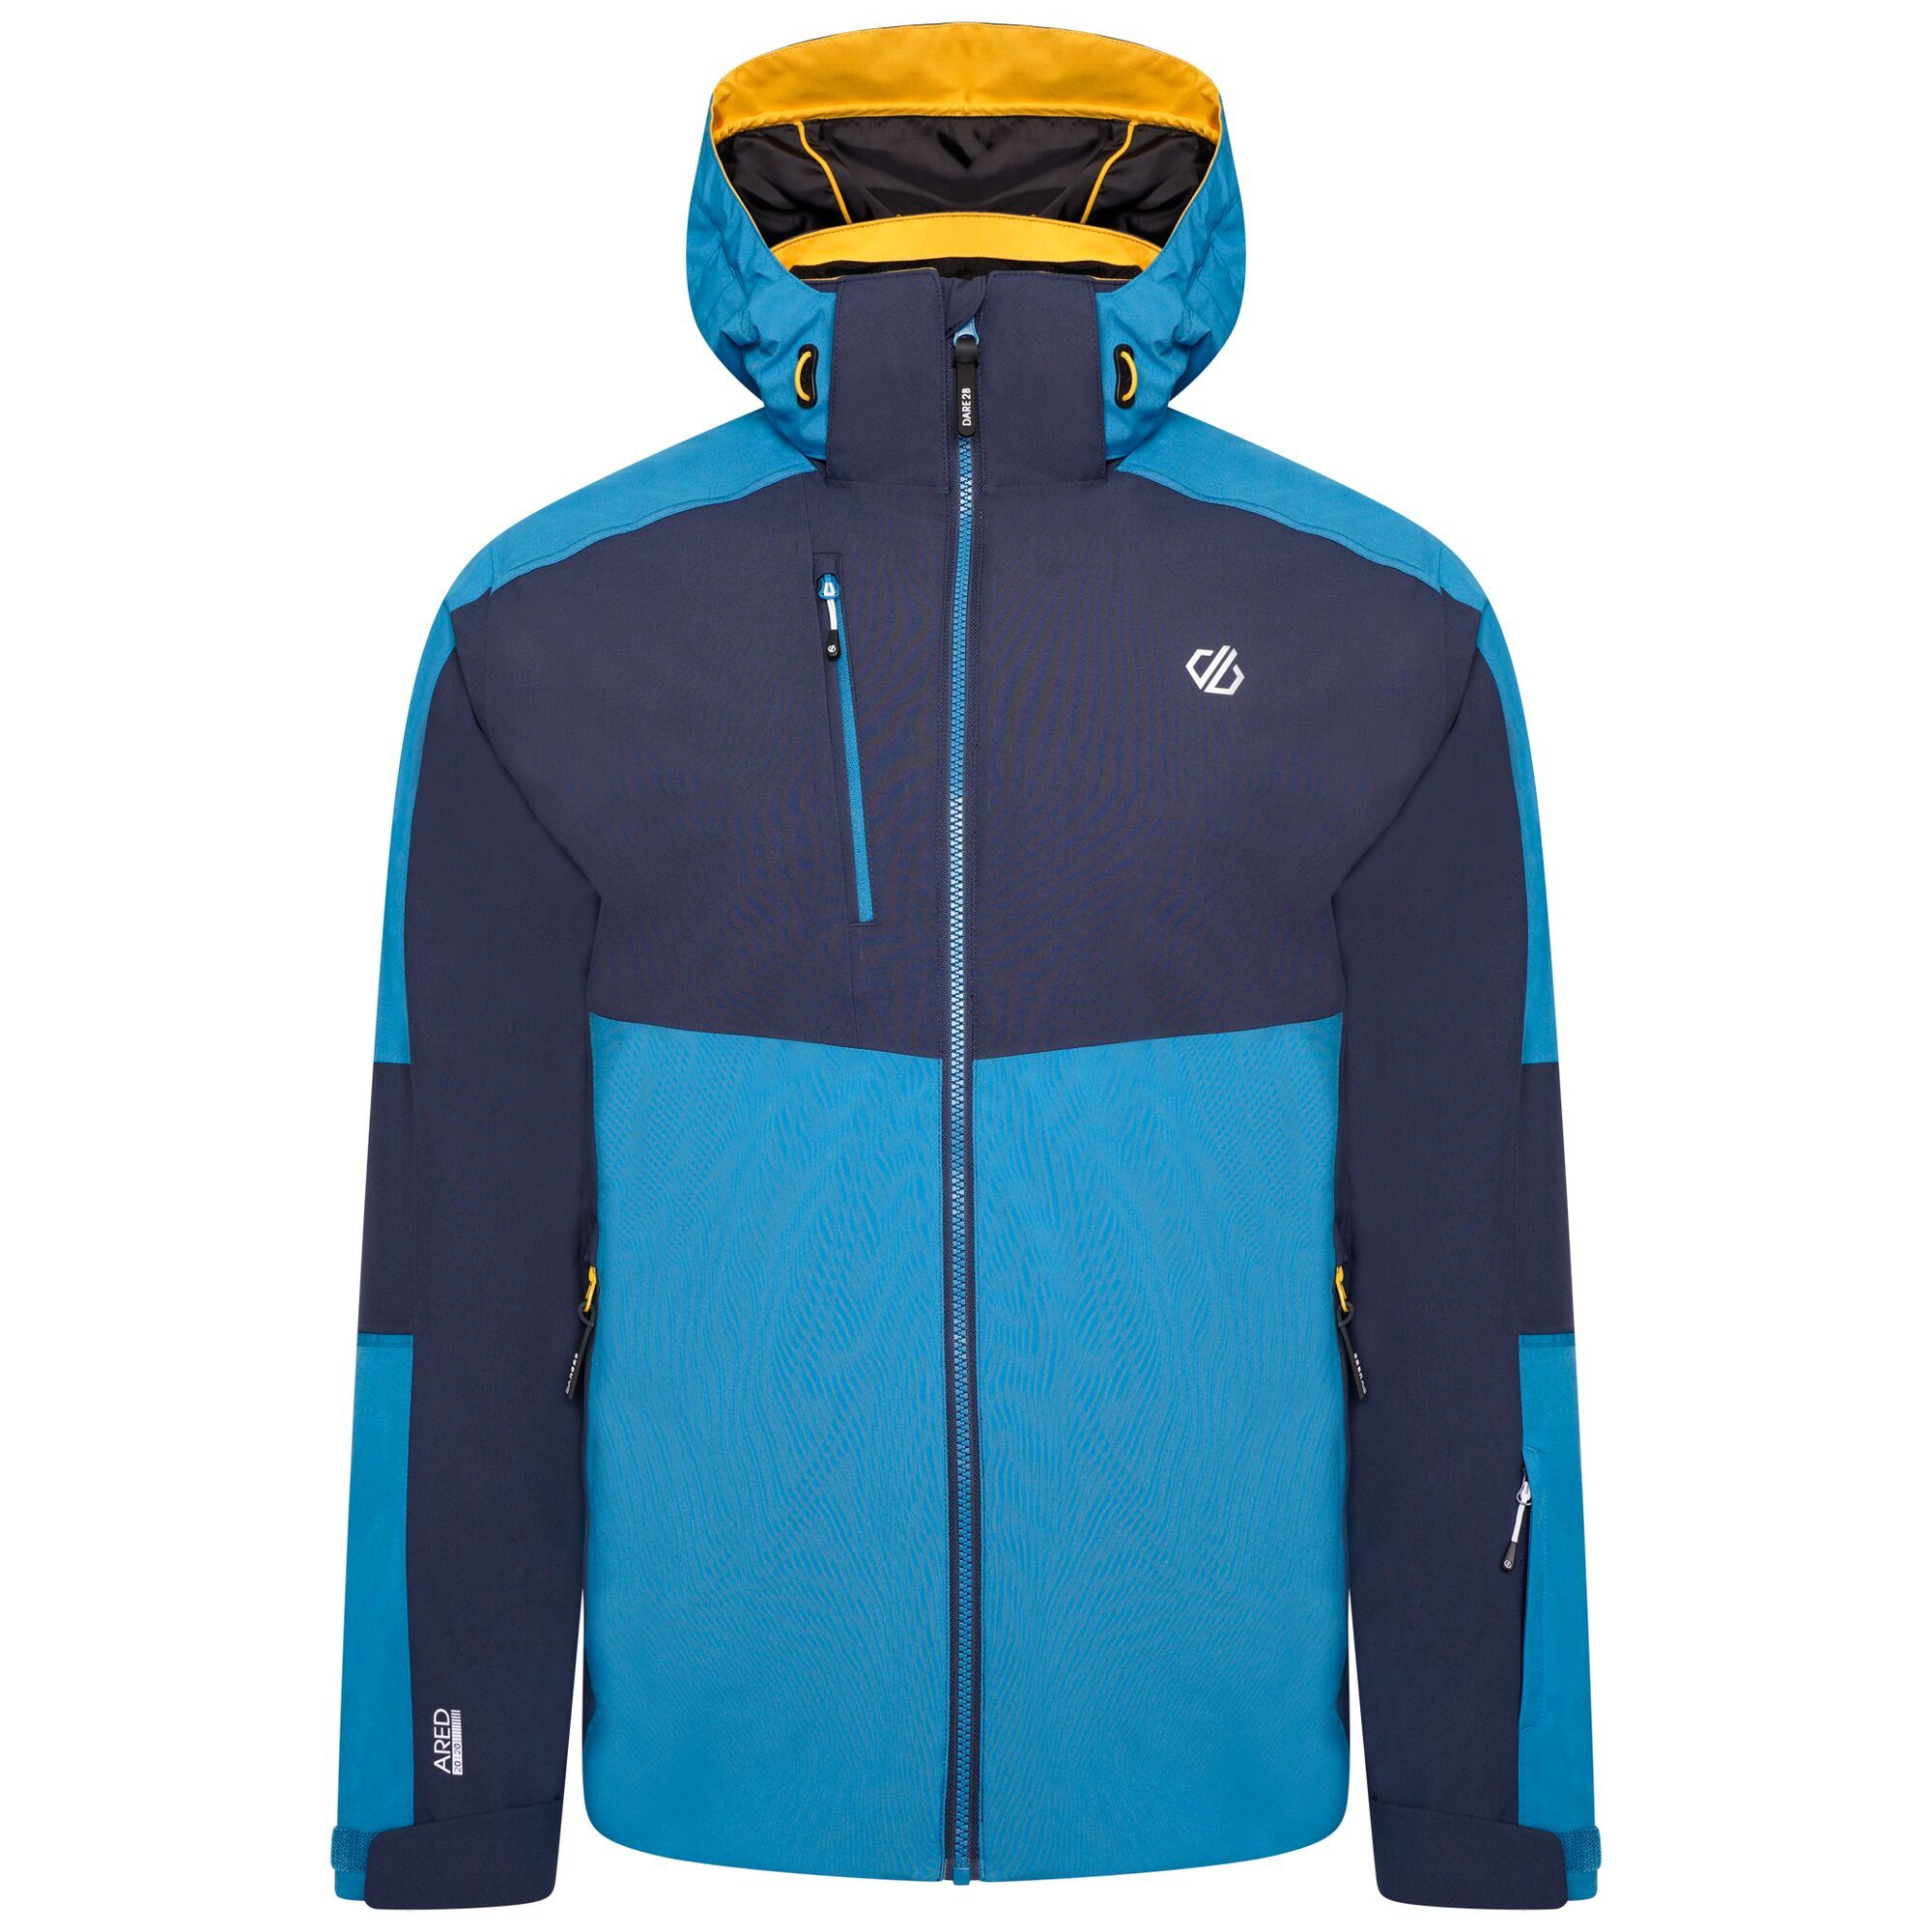 Dare 2b Intermit III Recycled WP Insulated Ski Jacket Mens - Nightfall